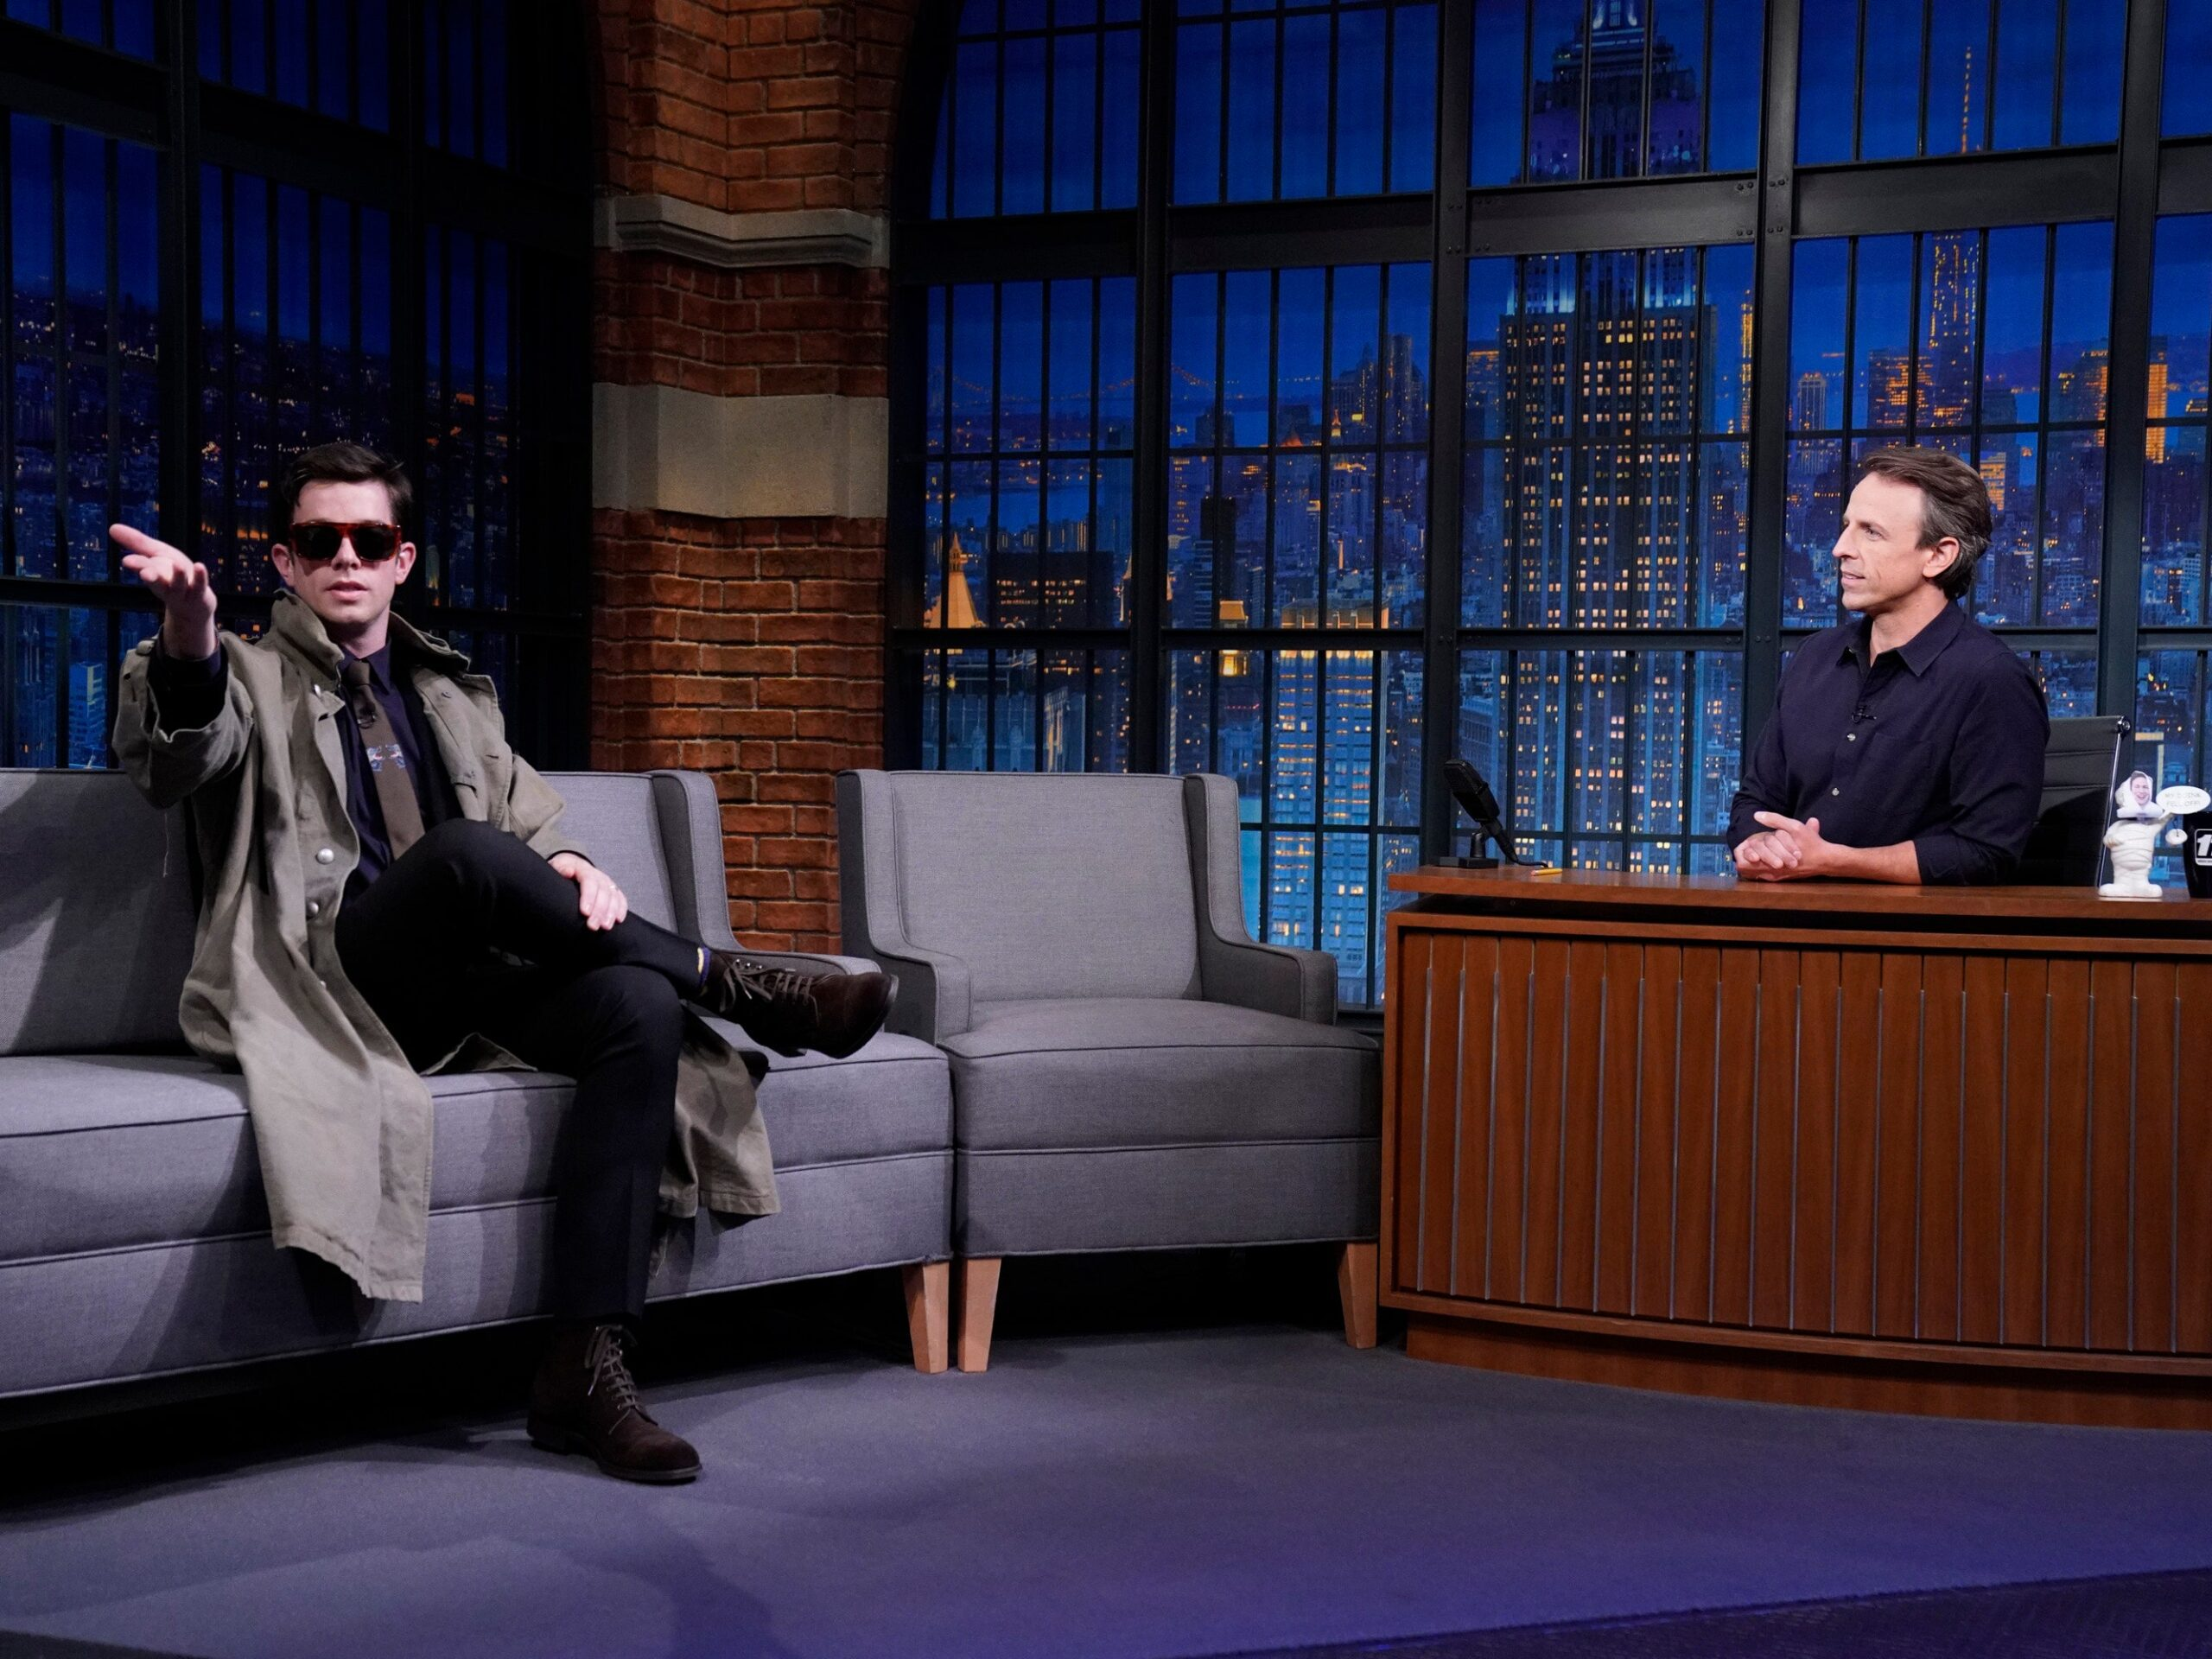 Pitchfork John Mulaney Joins Late Night With Seth Meyers as Staff Writer  